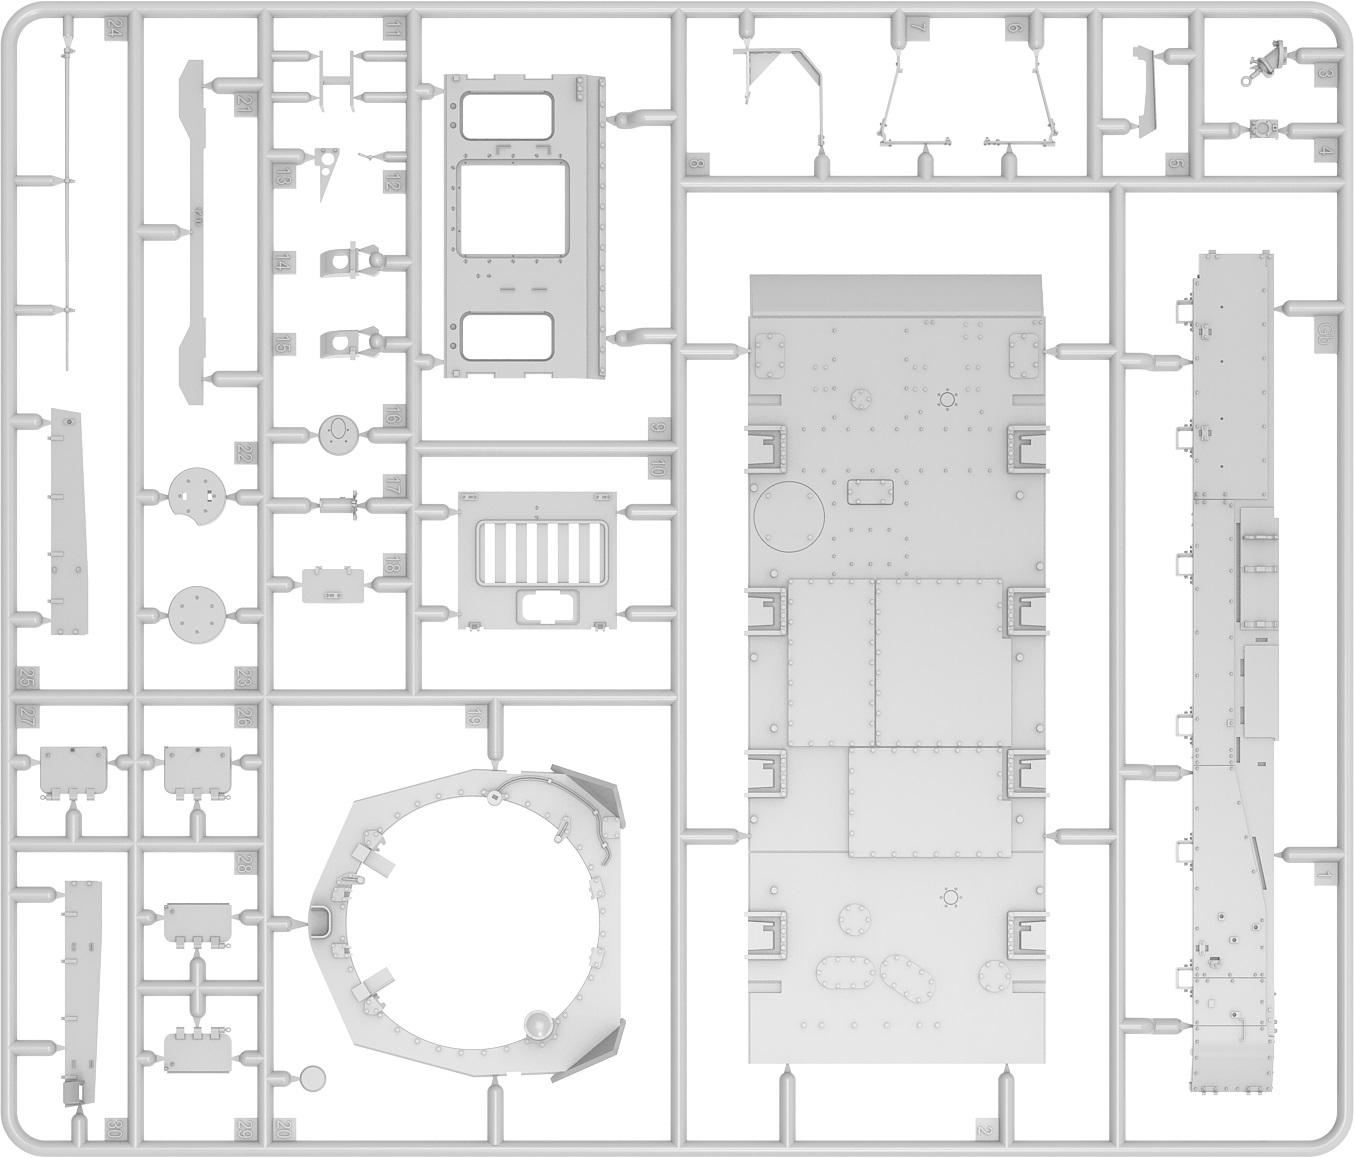 MiniArt-35339-Pz.-IV-37 Ankündigung: Pz. Kpfw. IV Ausf. J Nibelungenwerk Mid Prod Sep-Nov 1944 1:35 Miniart (#35339)